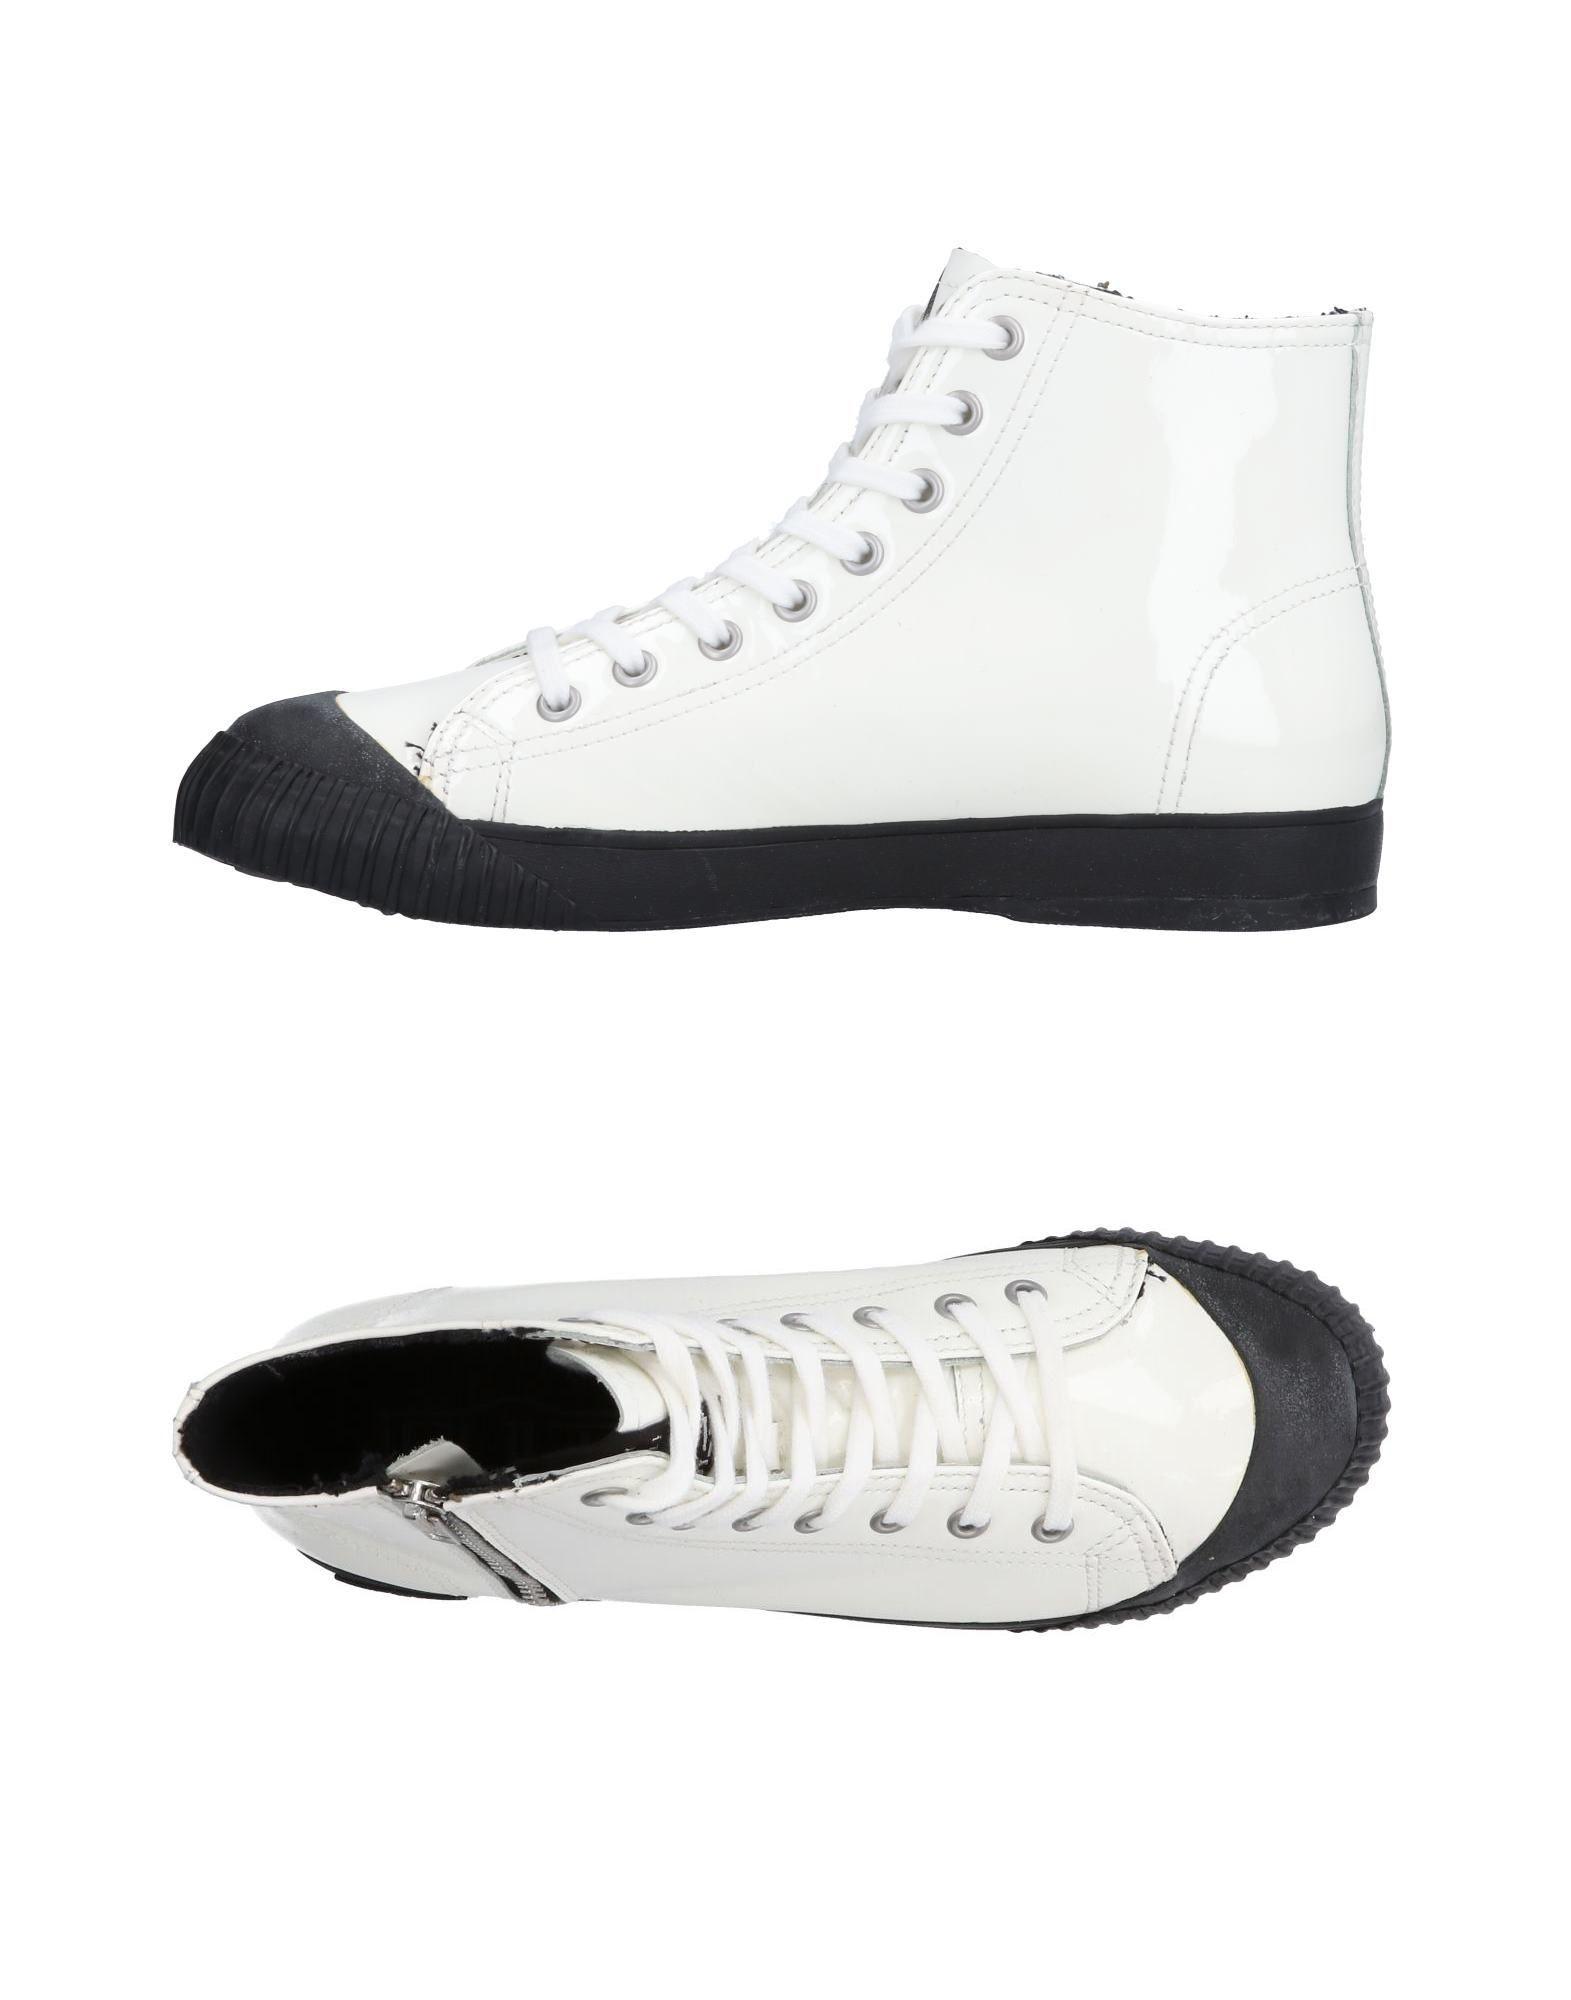 Sneakers Cult Donna - 11498236TT elegante